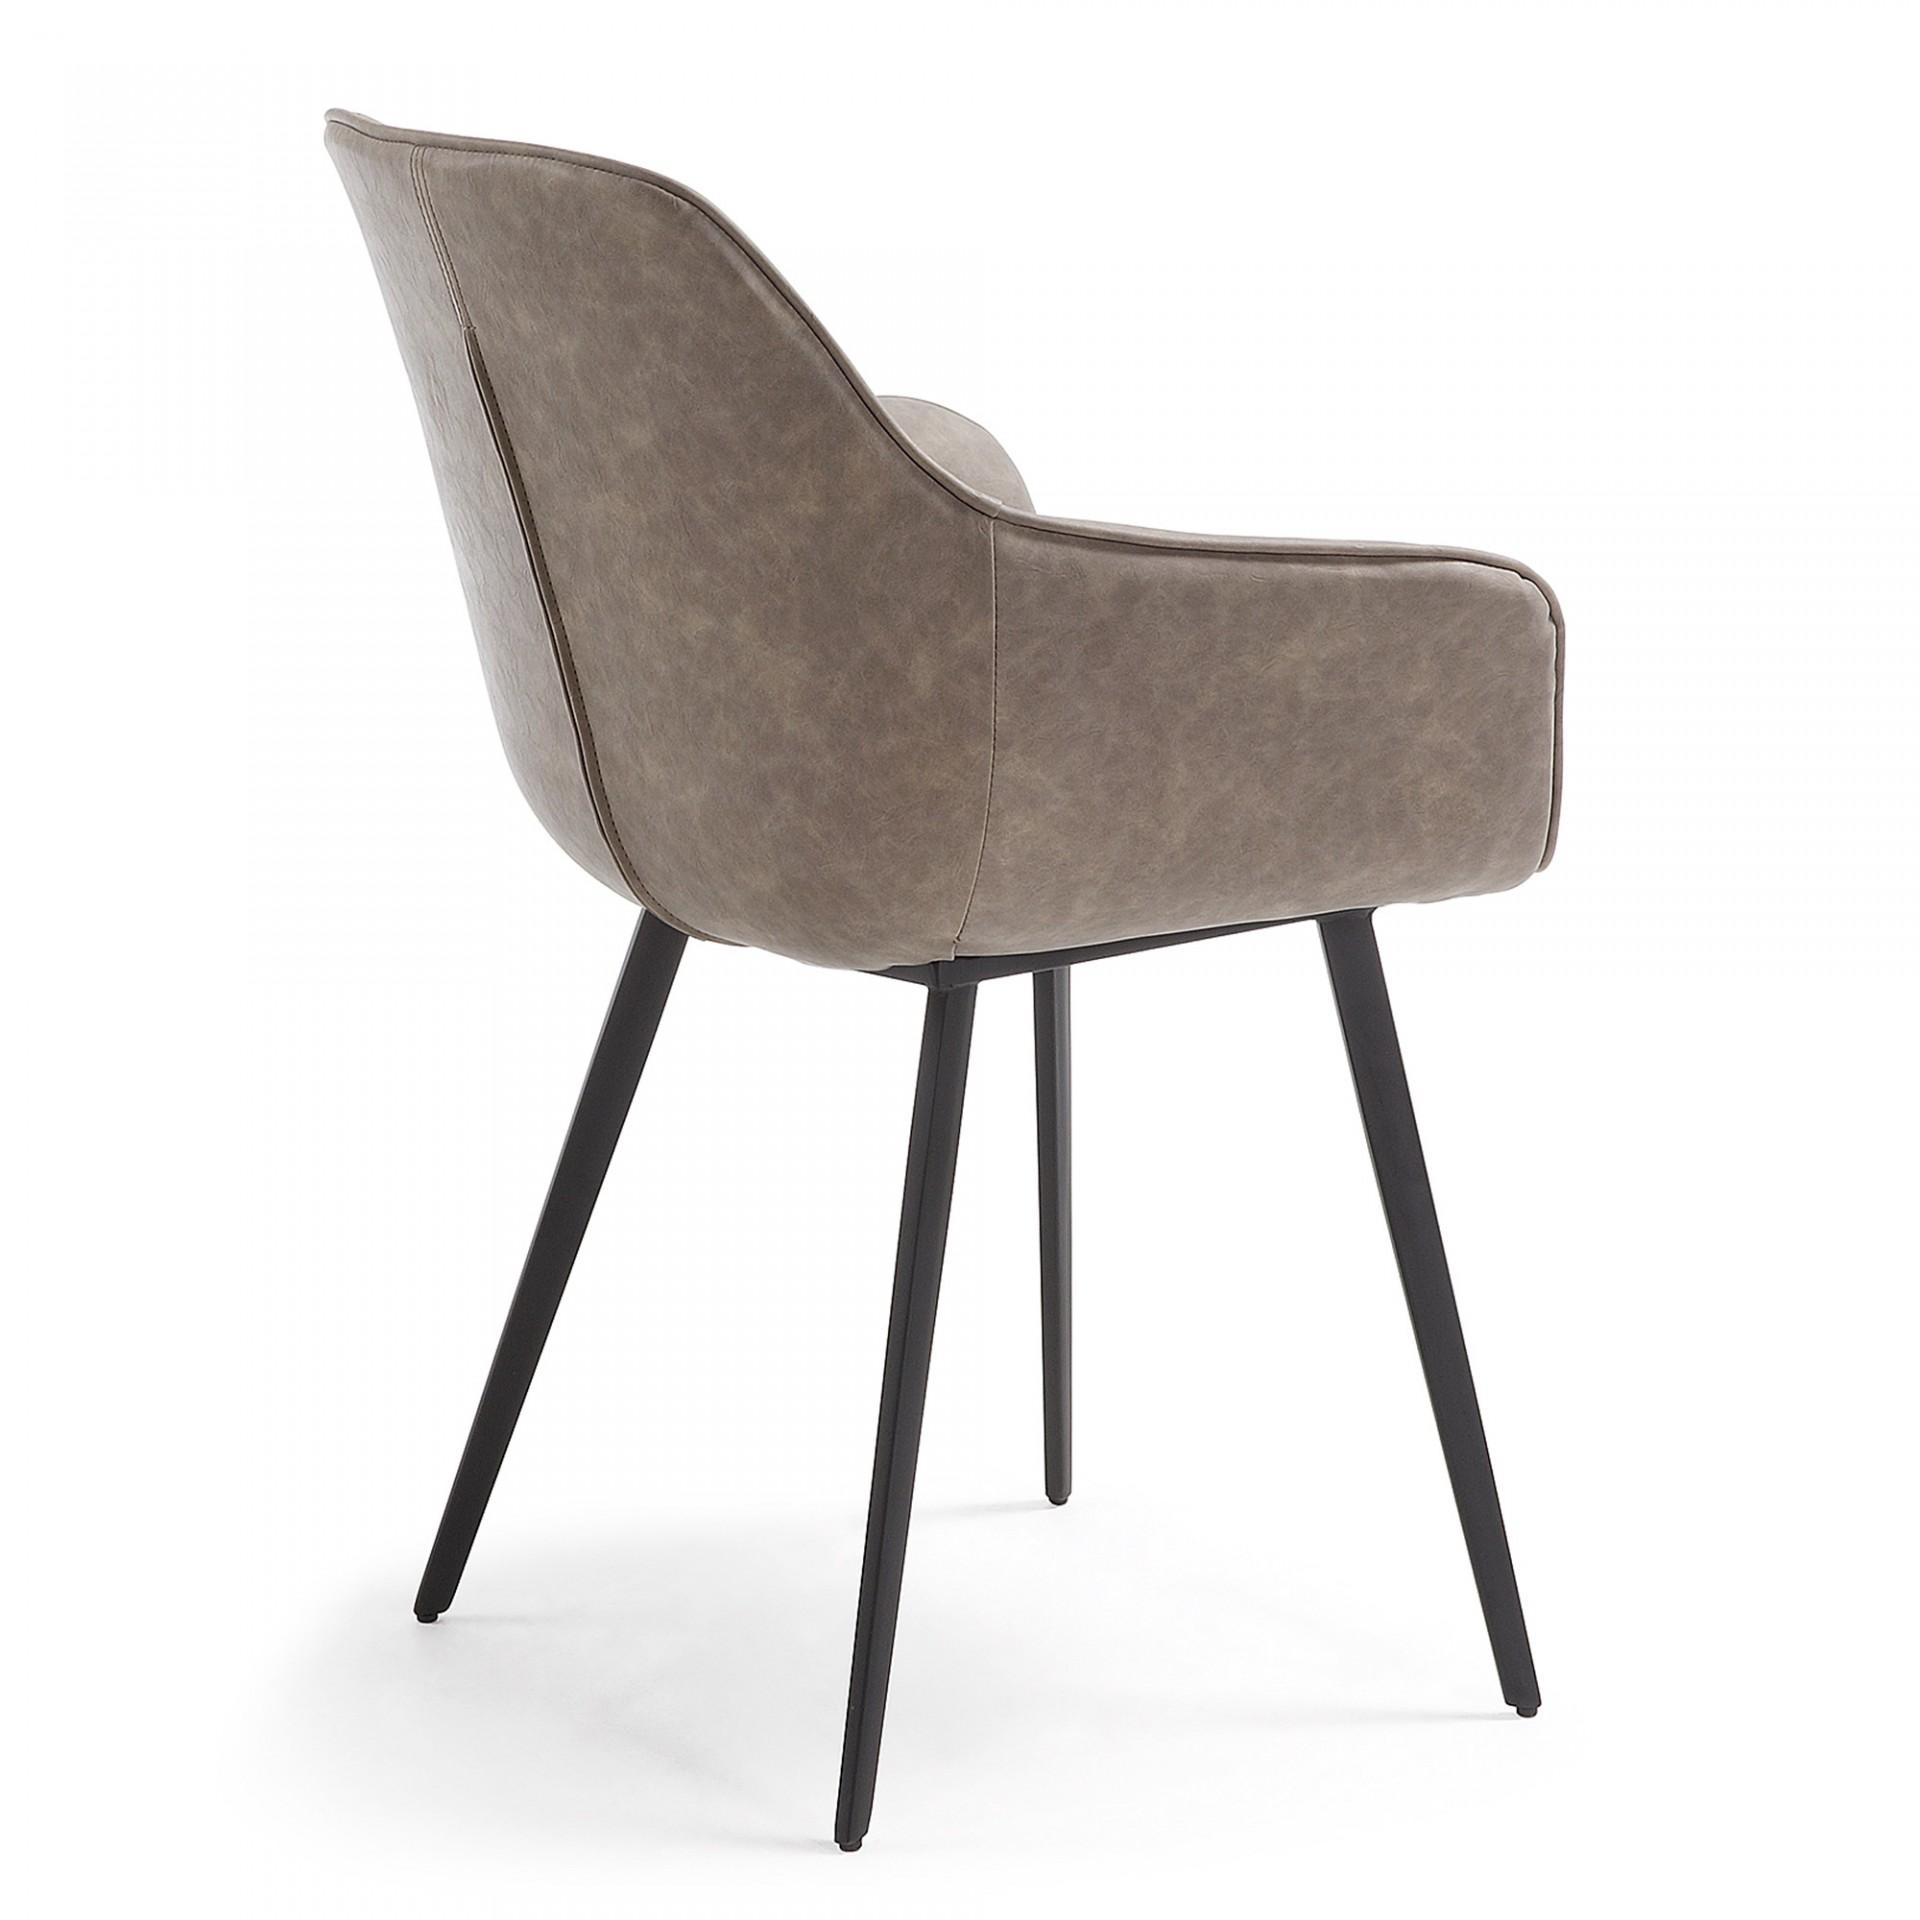 Cadeira Almira, c/braços, pele sintética